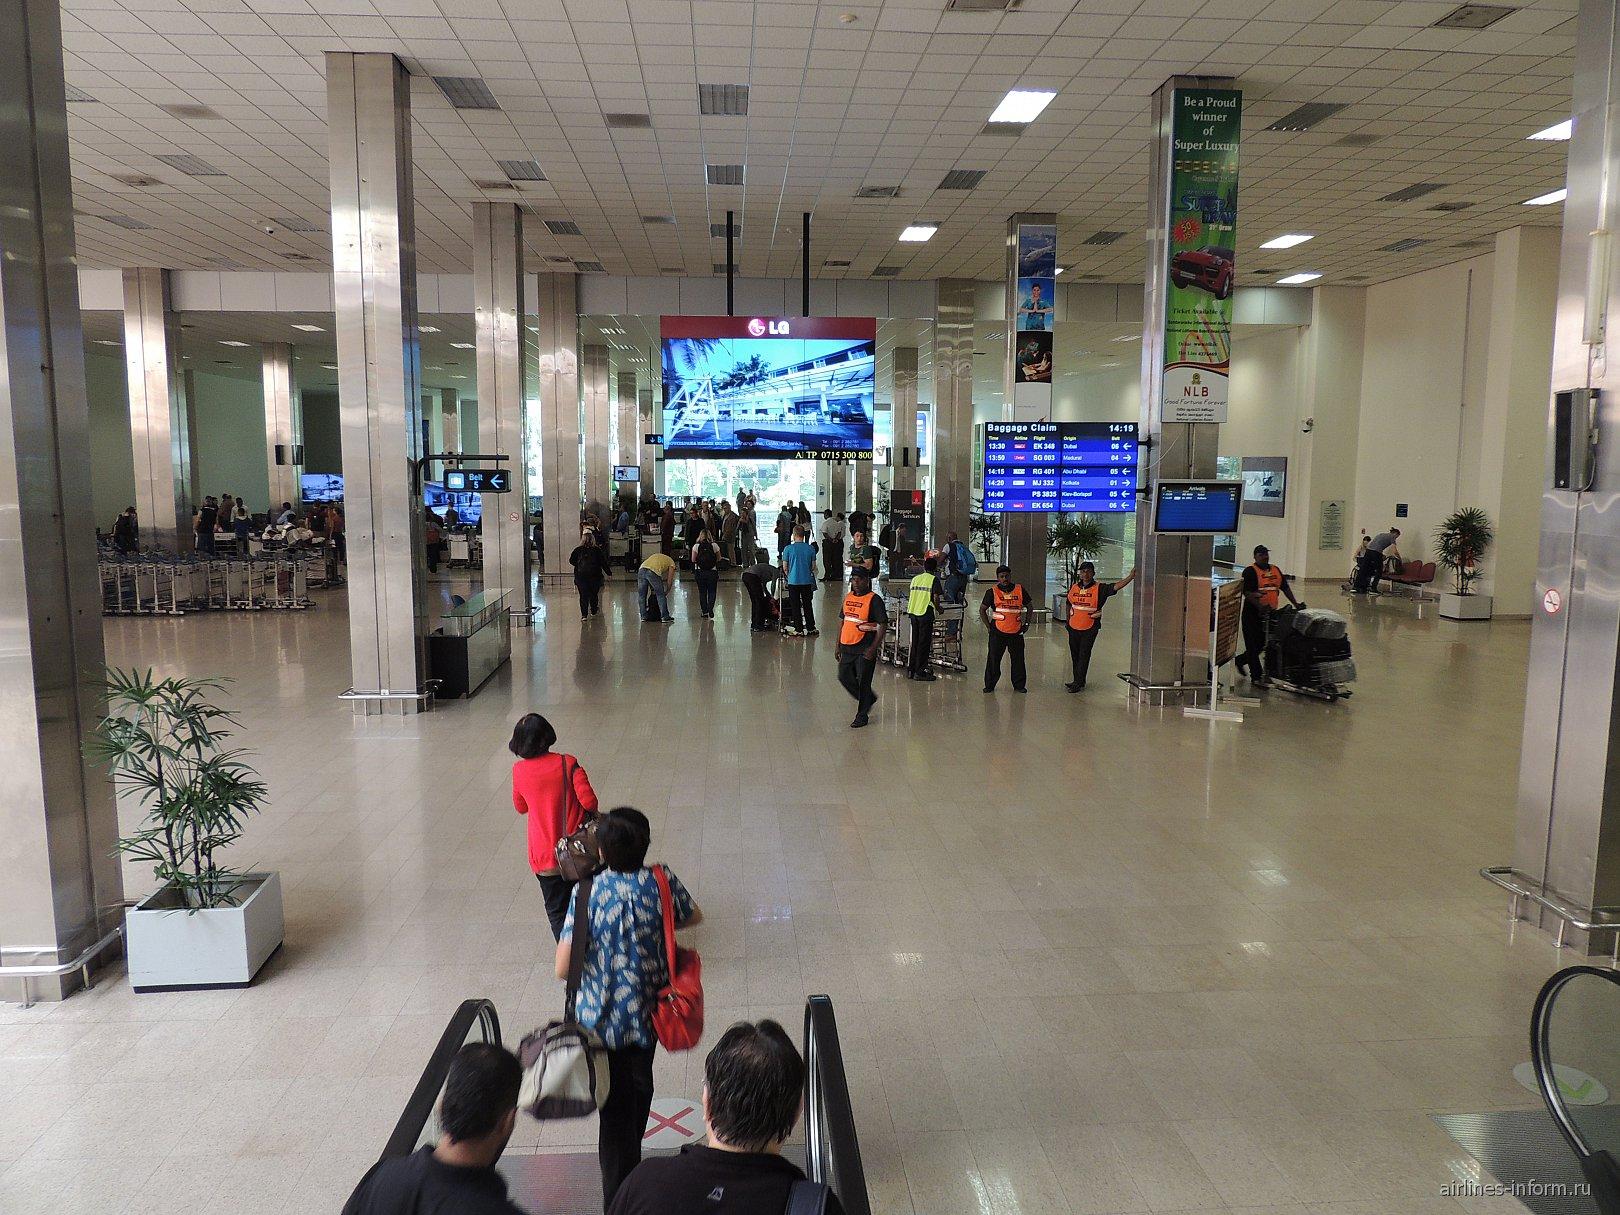 Зал выдачи багажа в аэропорту Коломбо Бандаранайке